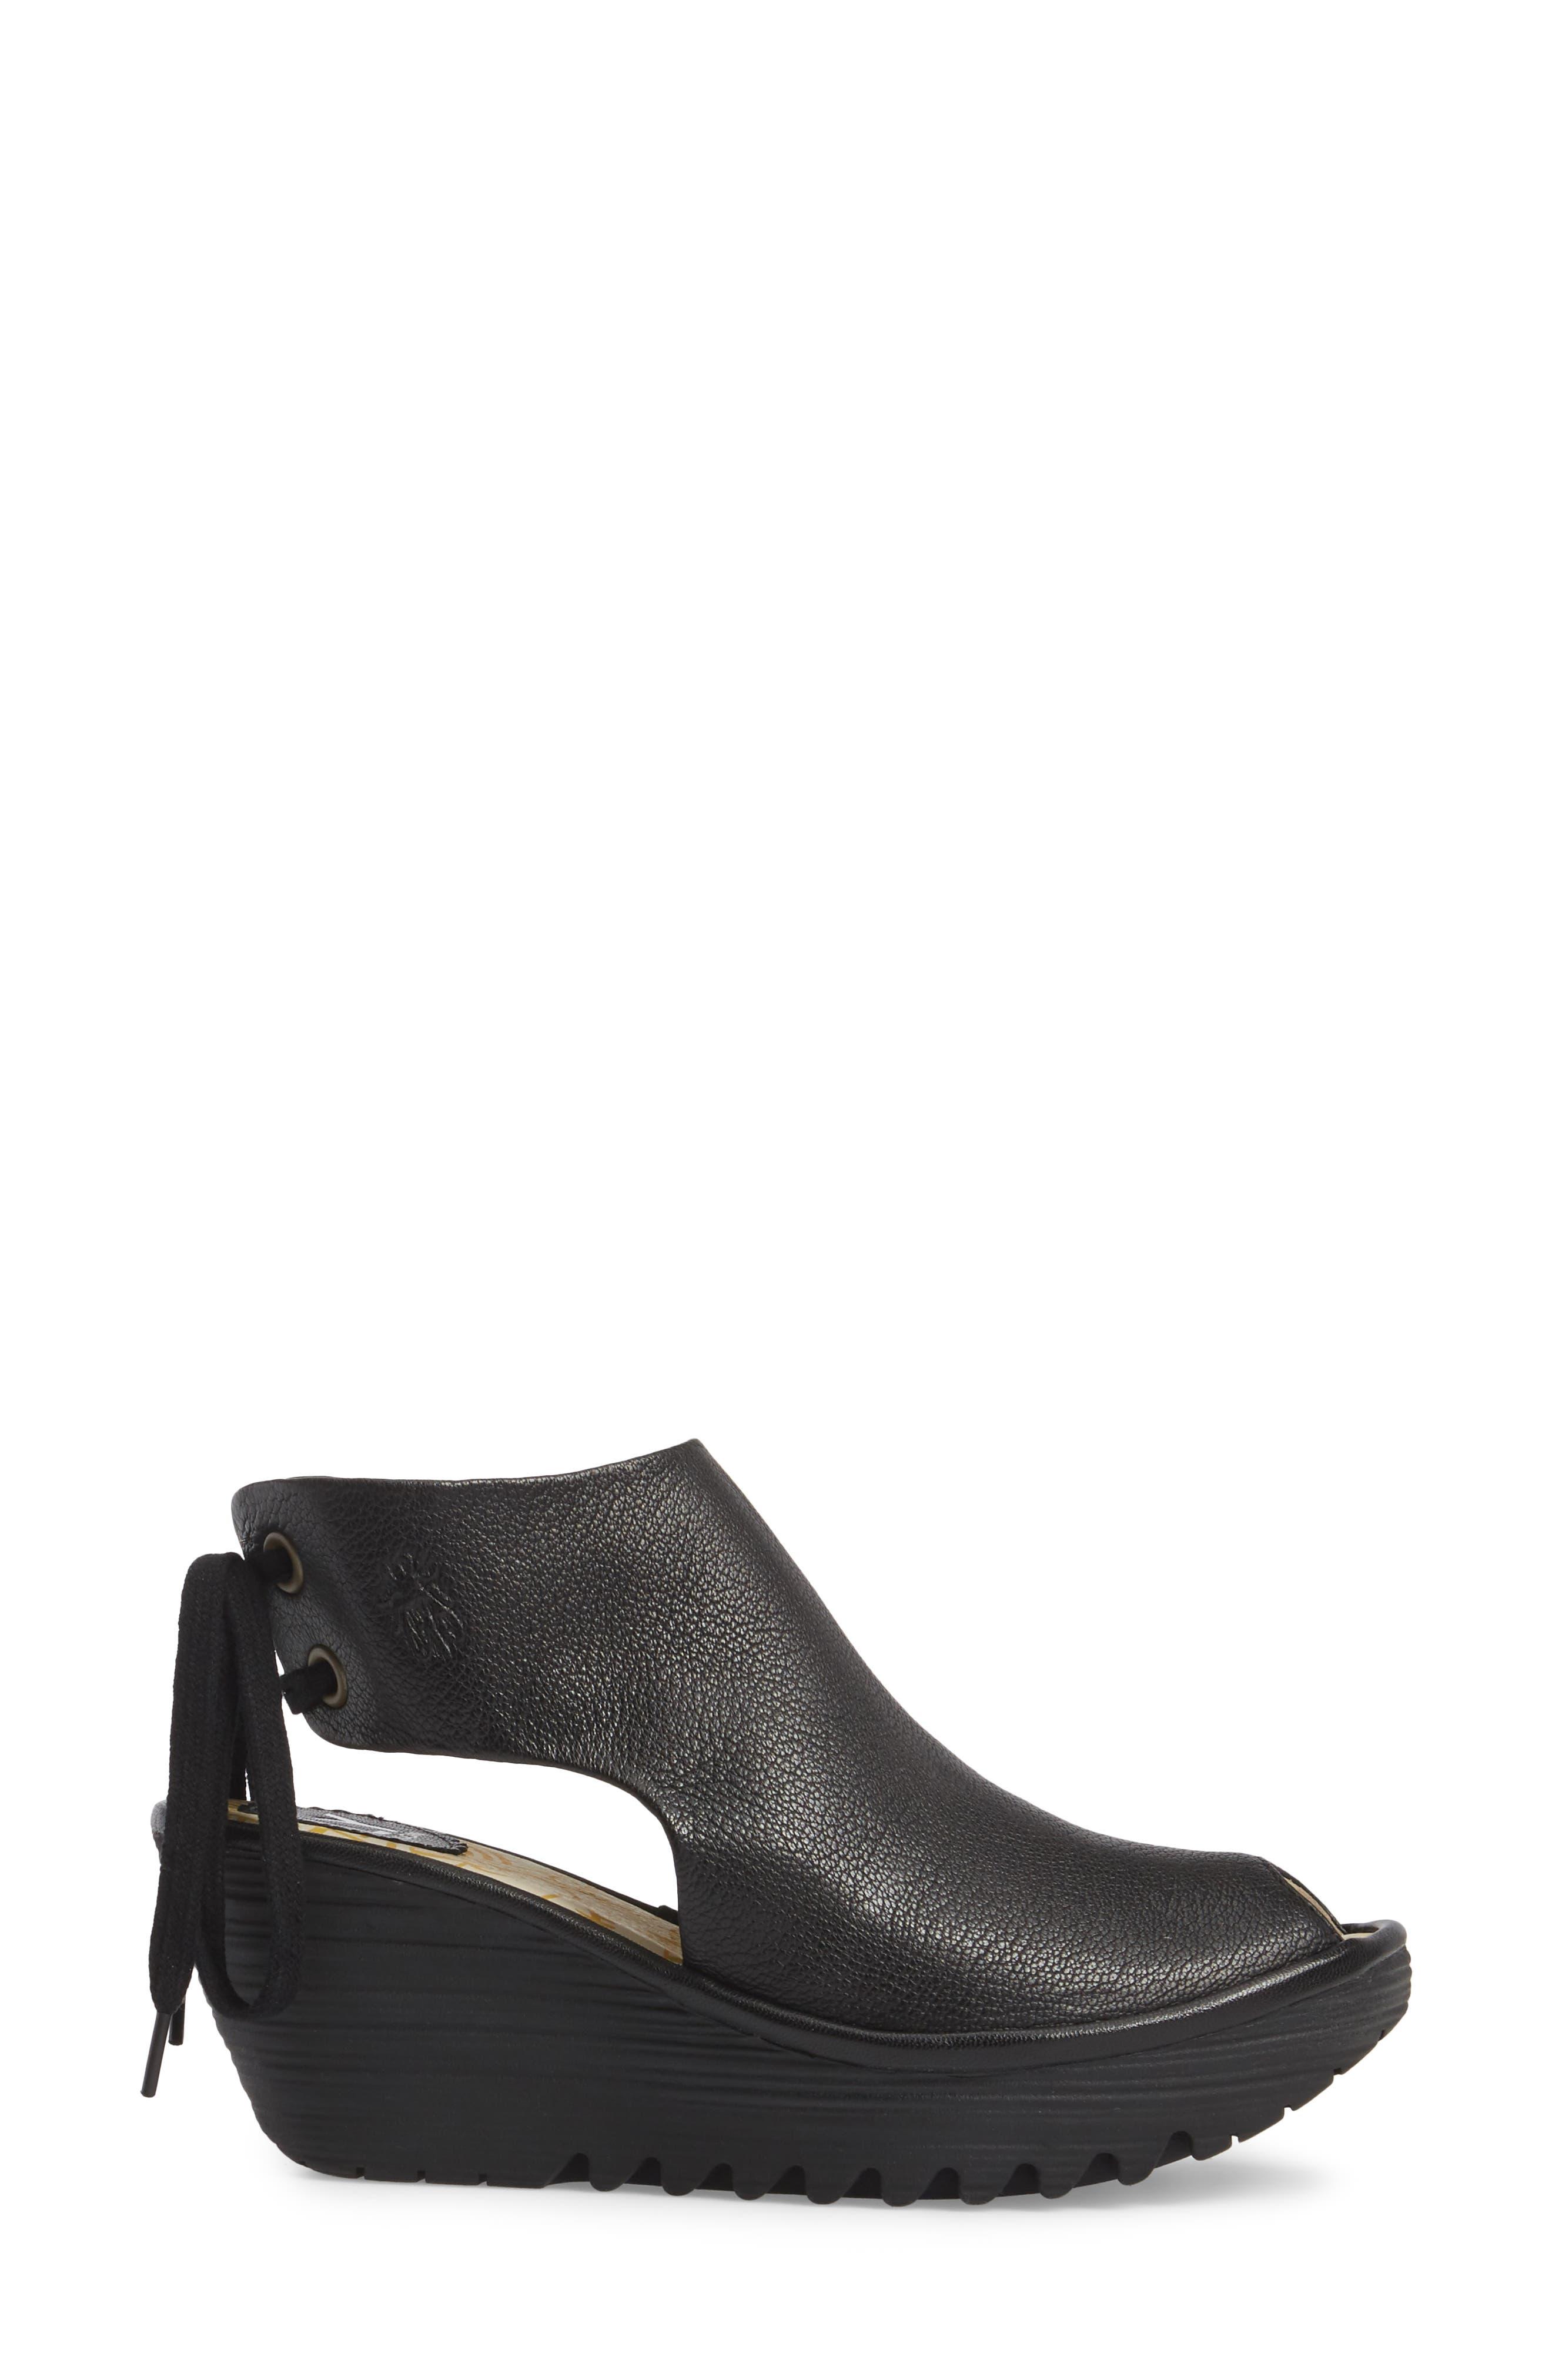 Yuzu Wedge Sandal,                             Alternate thumbnail 3, color,                             Black Mousse Leather